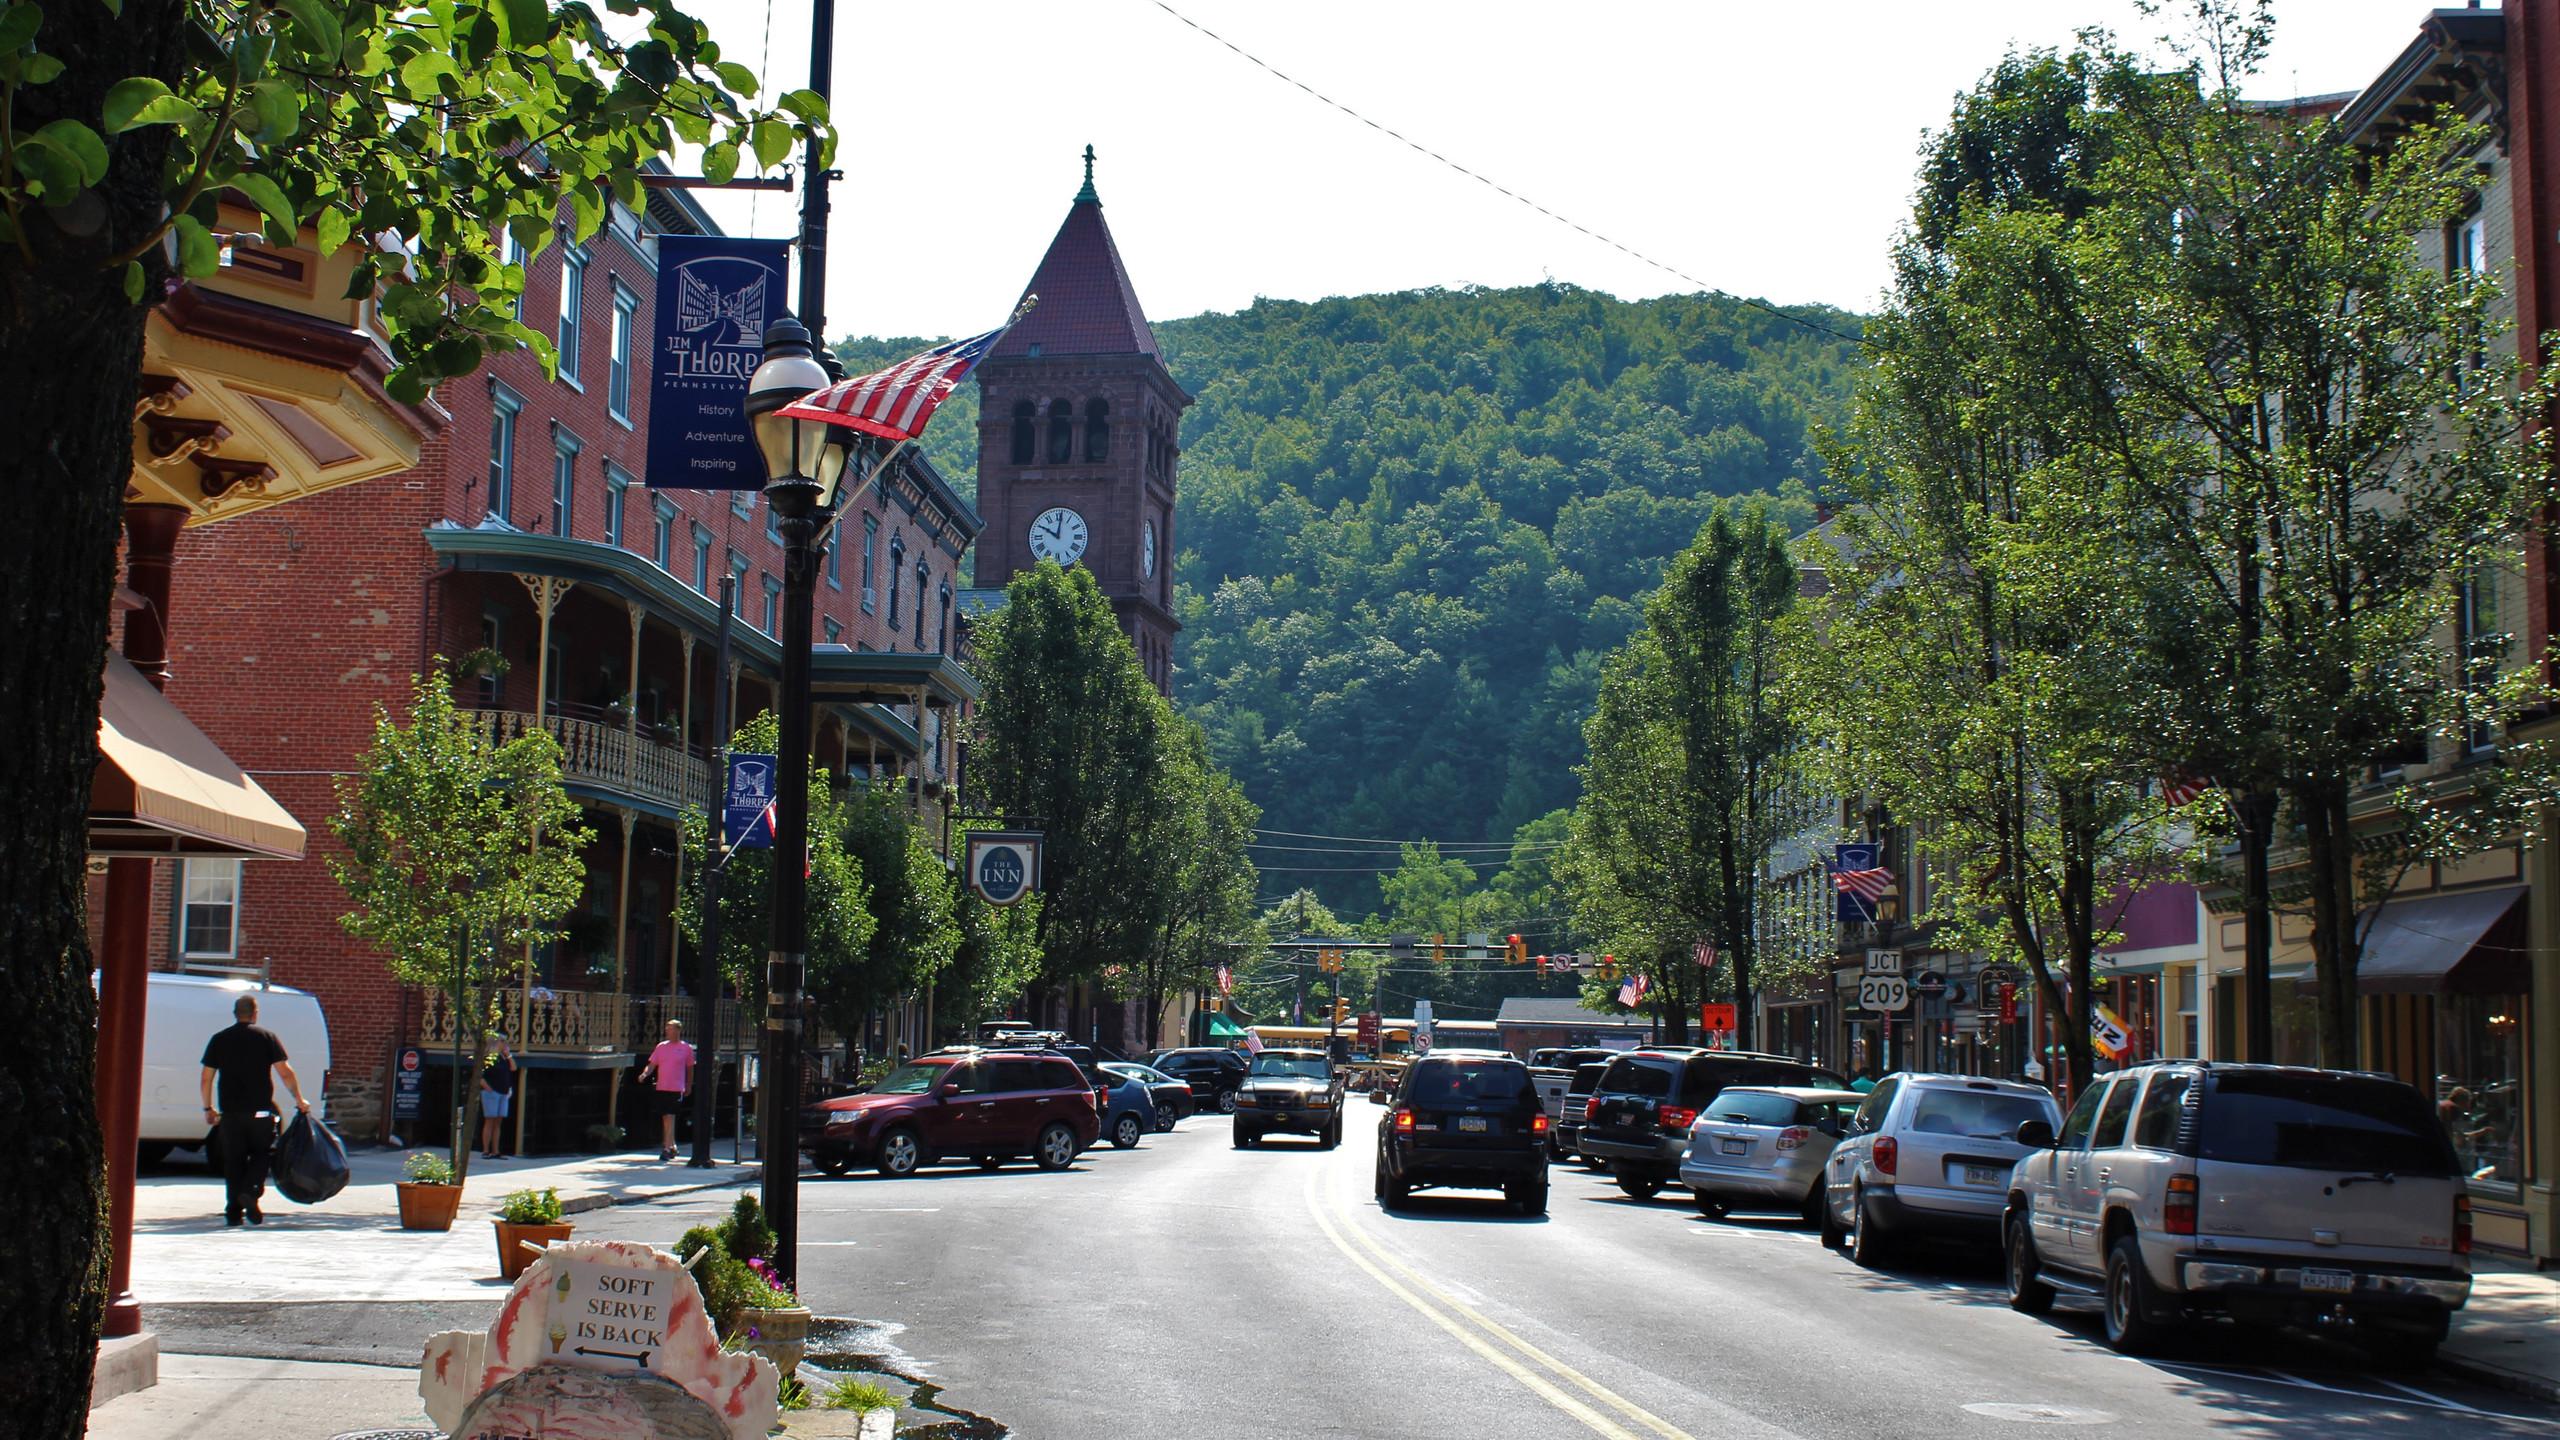 Main Street of Jim Thorpe